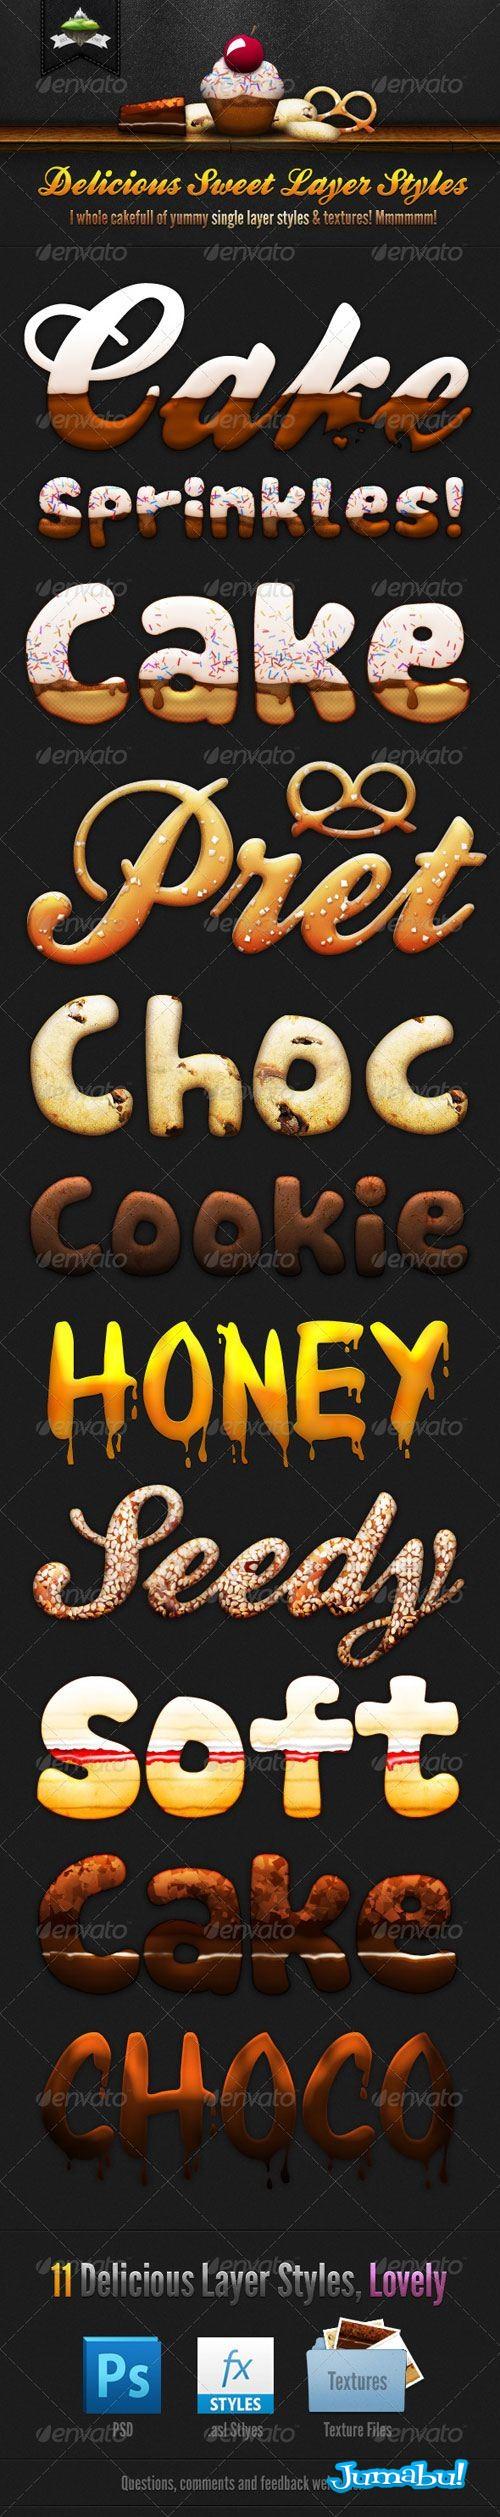 fuentes-tortas-dulces-postres